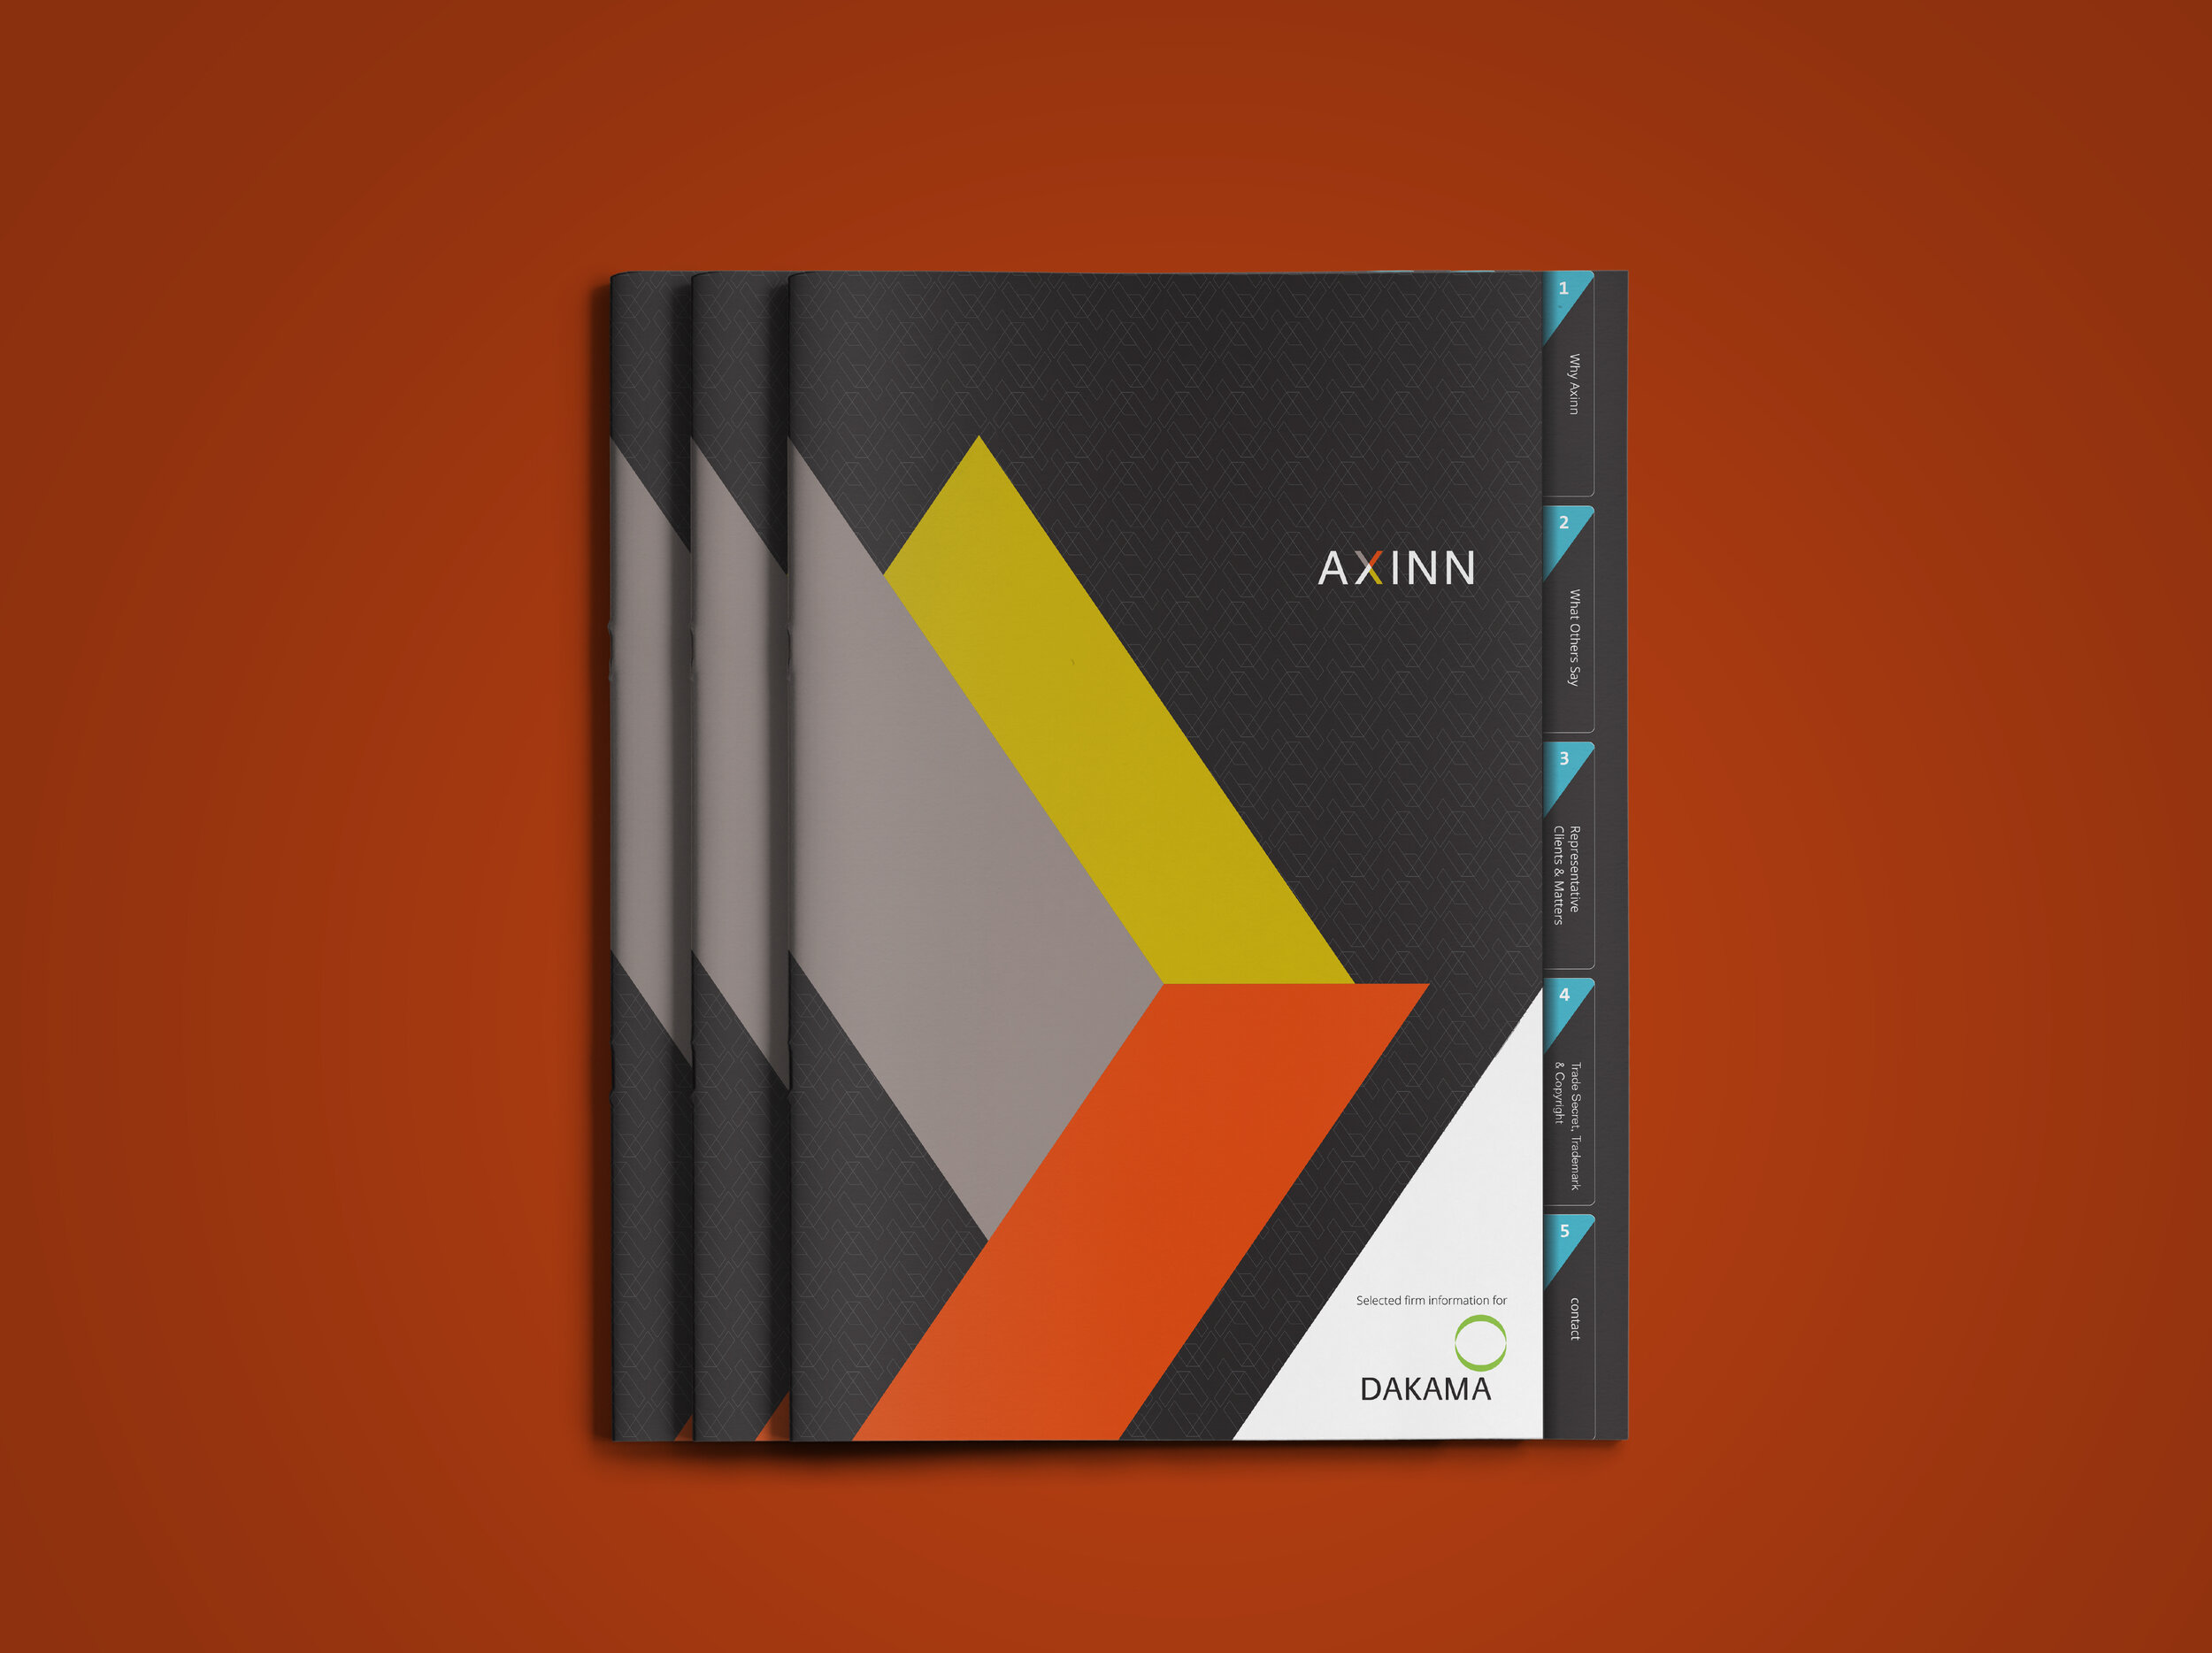 axinn front cover 2.jpg